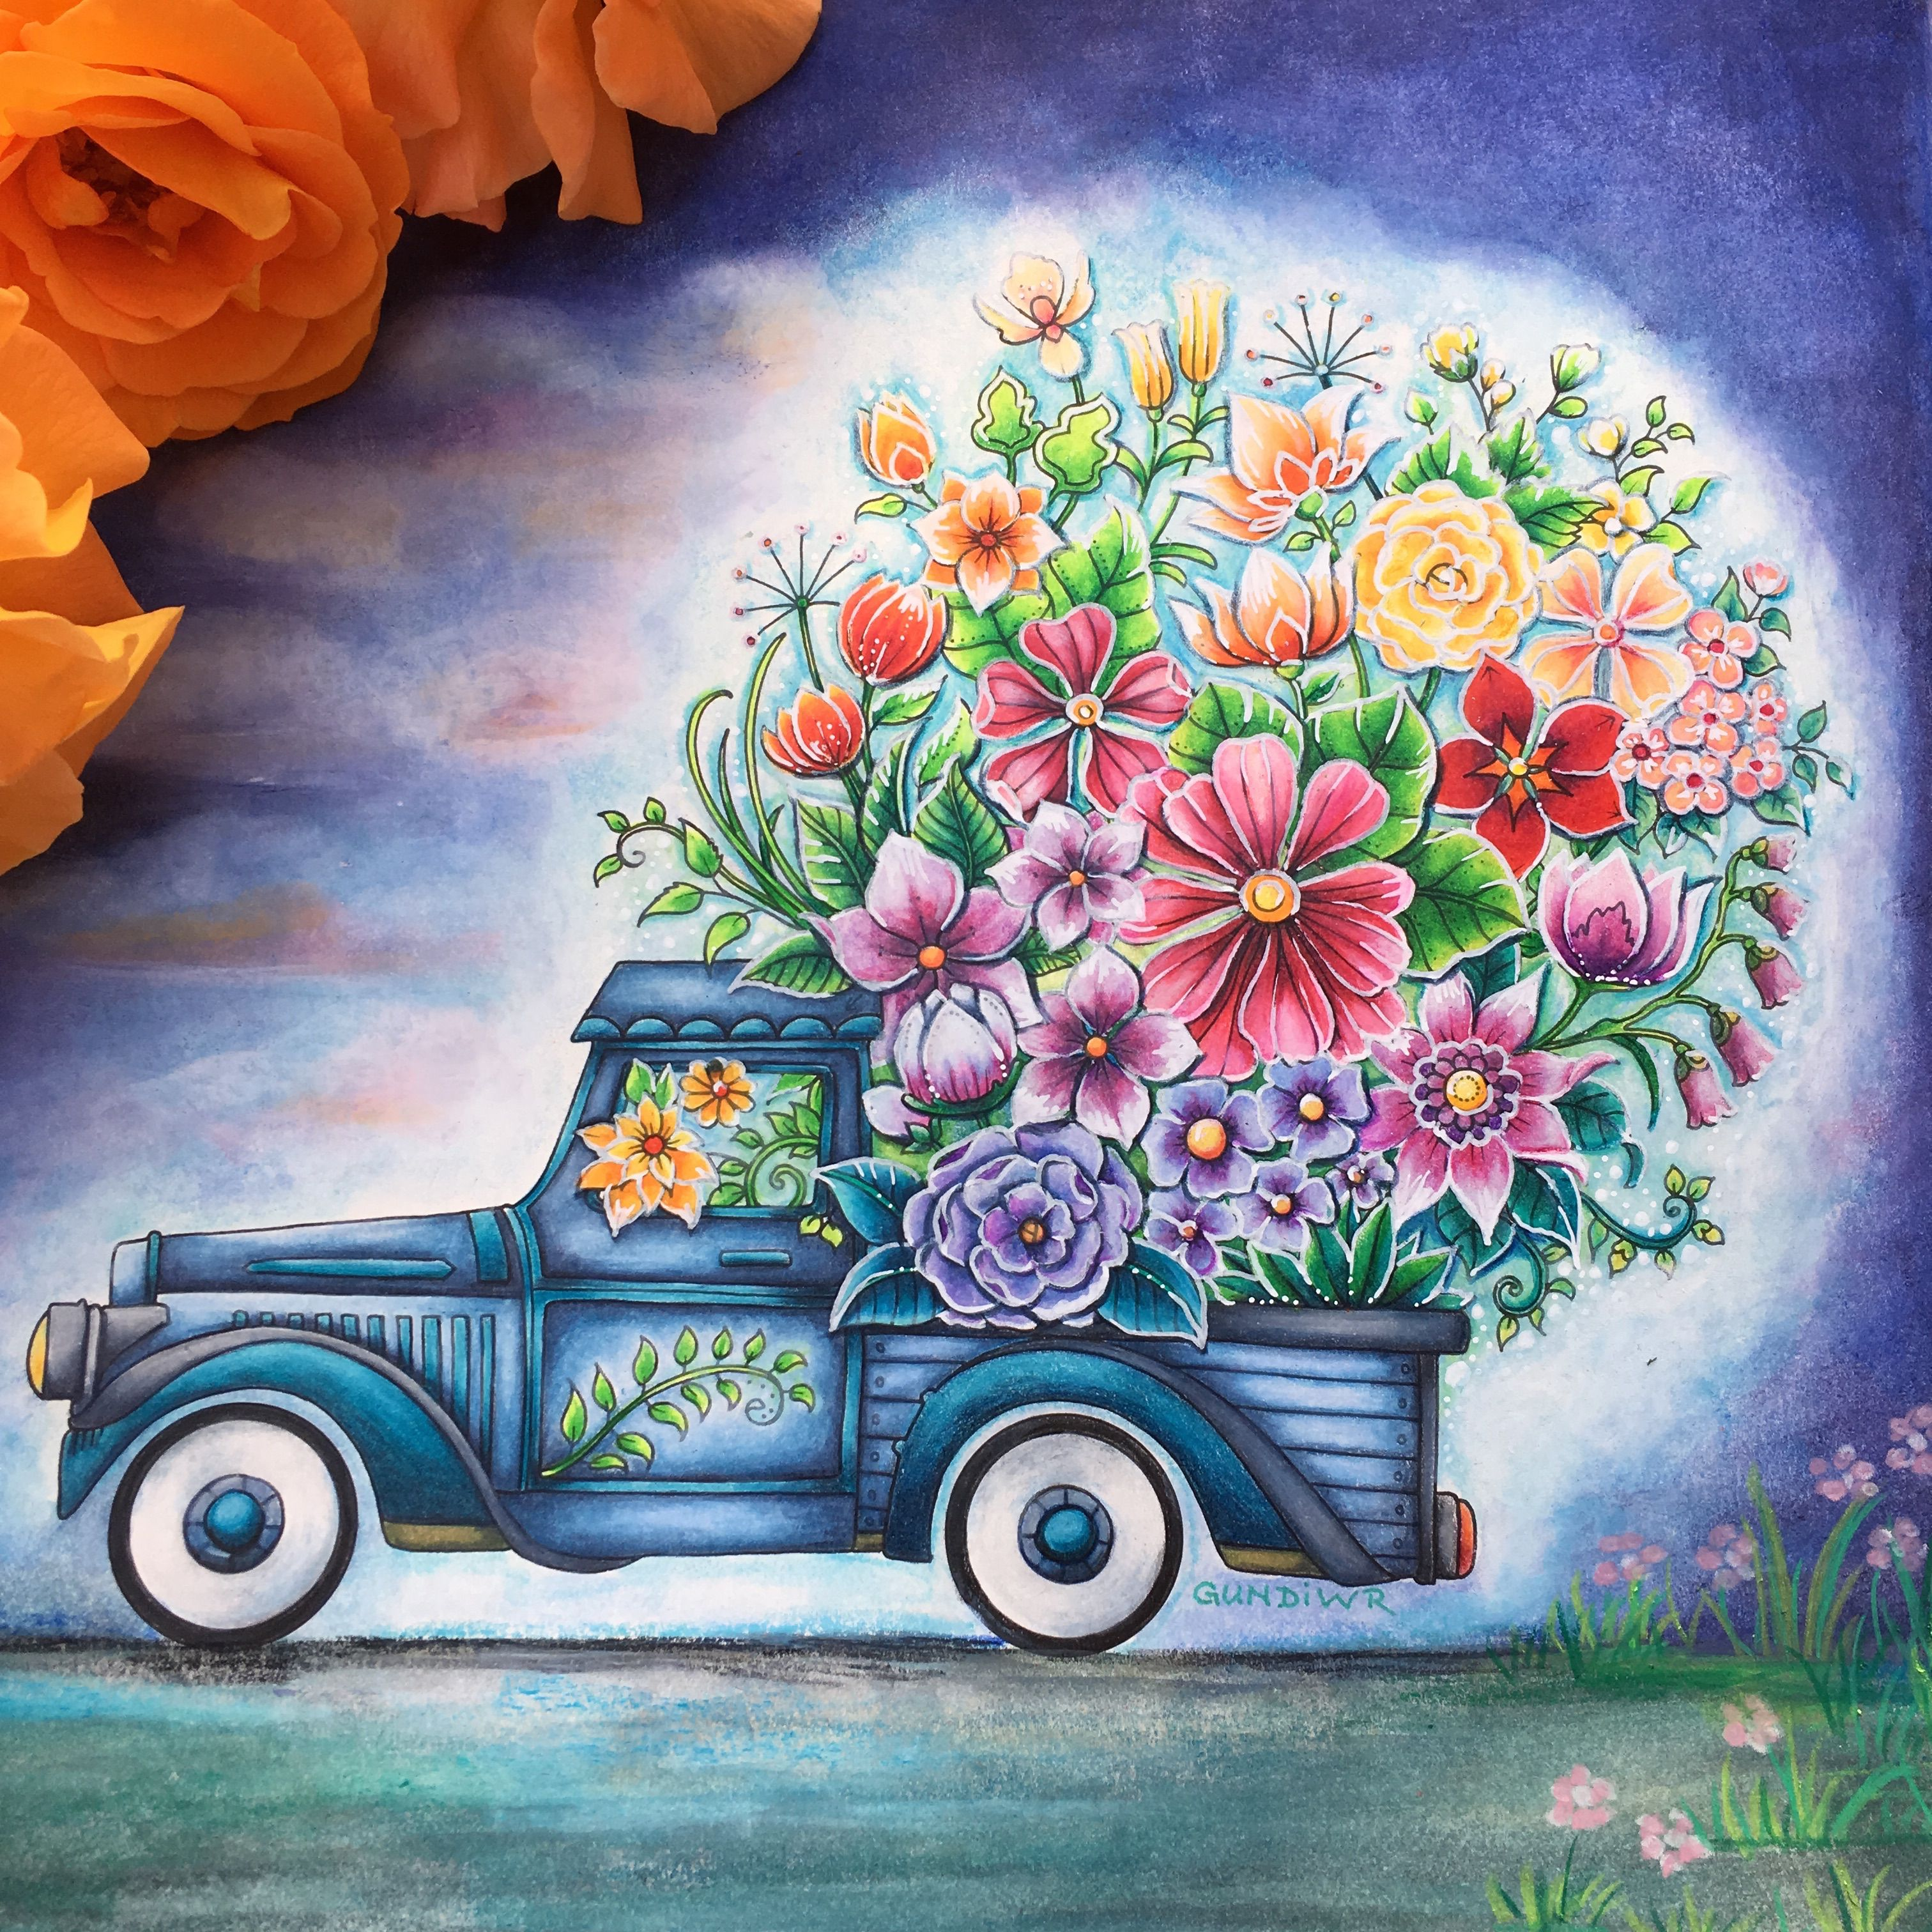 330 World Of Flowers Johanna Basford Ideas Basford Johanna Basford Johanna Basford Coloring